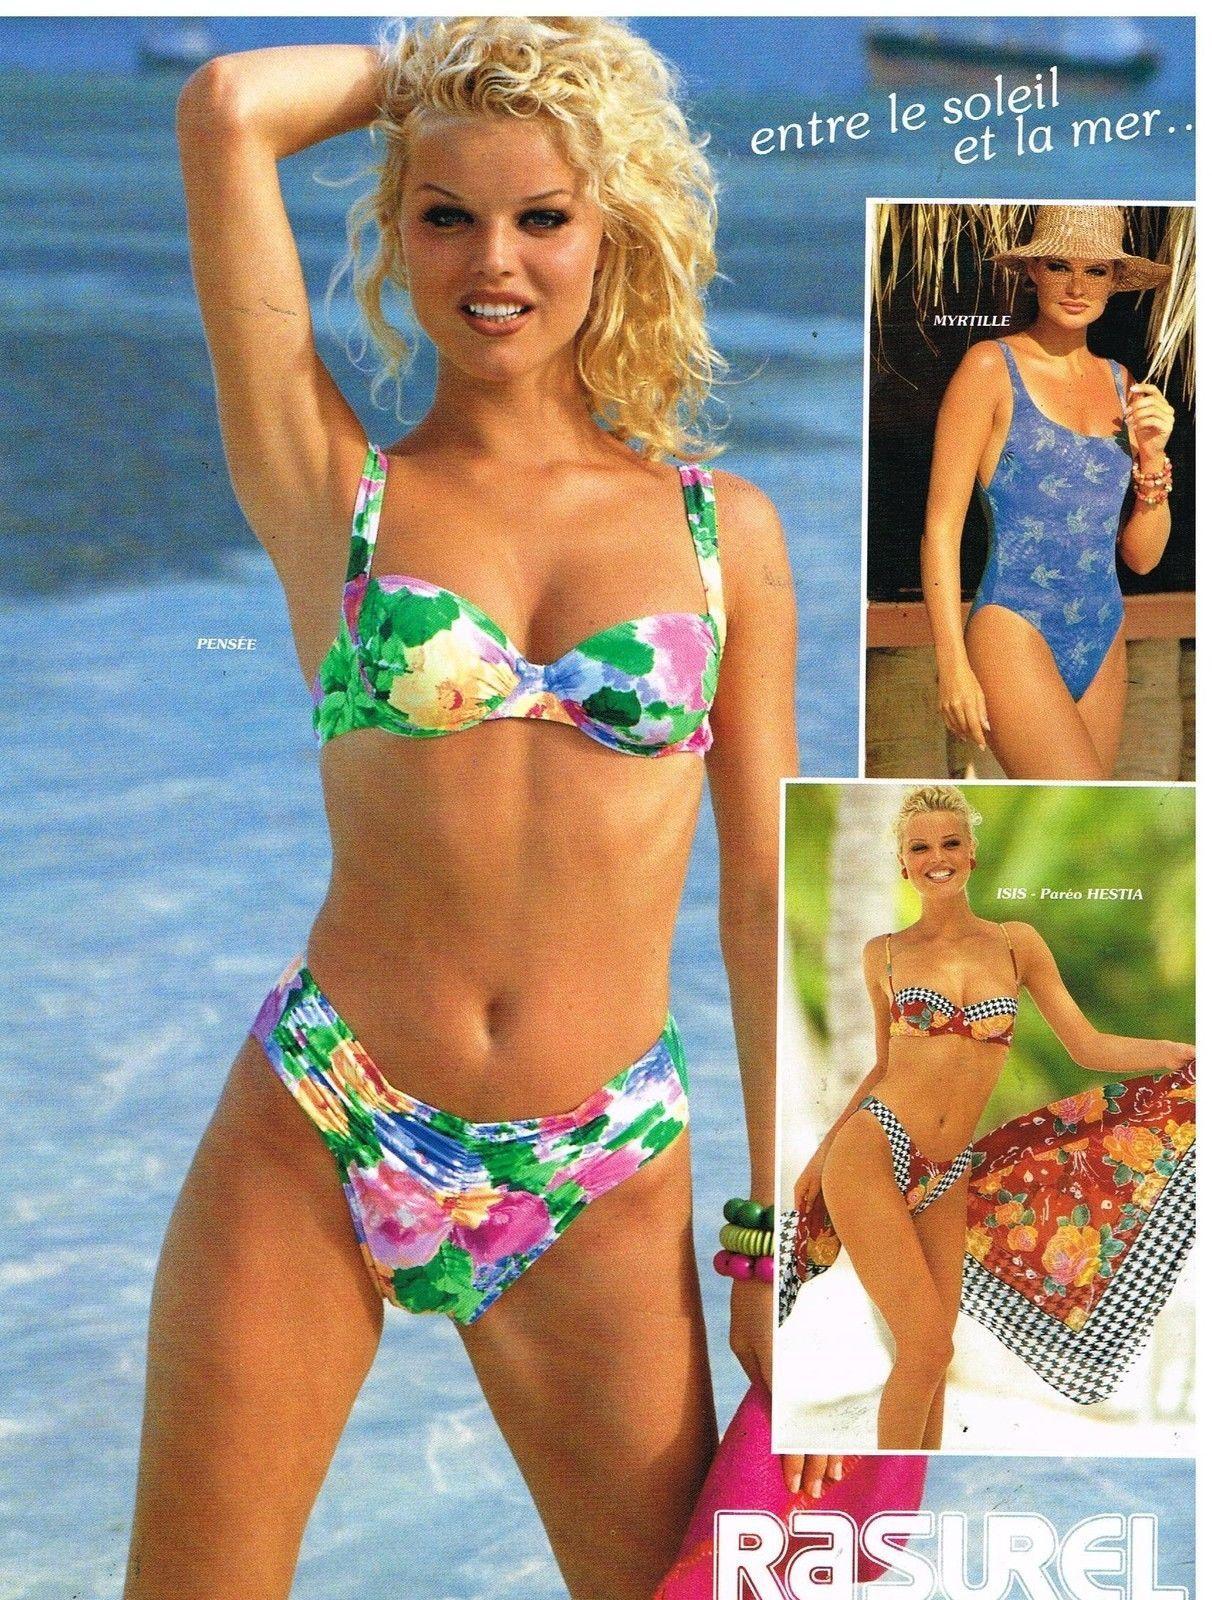 Bikini Eva Herzigova nudes (84 foto and video), Tits, Paparazzi, Twitter, underwear 2017